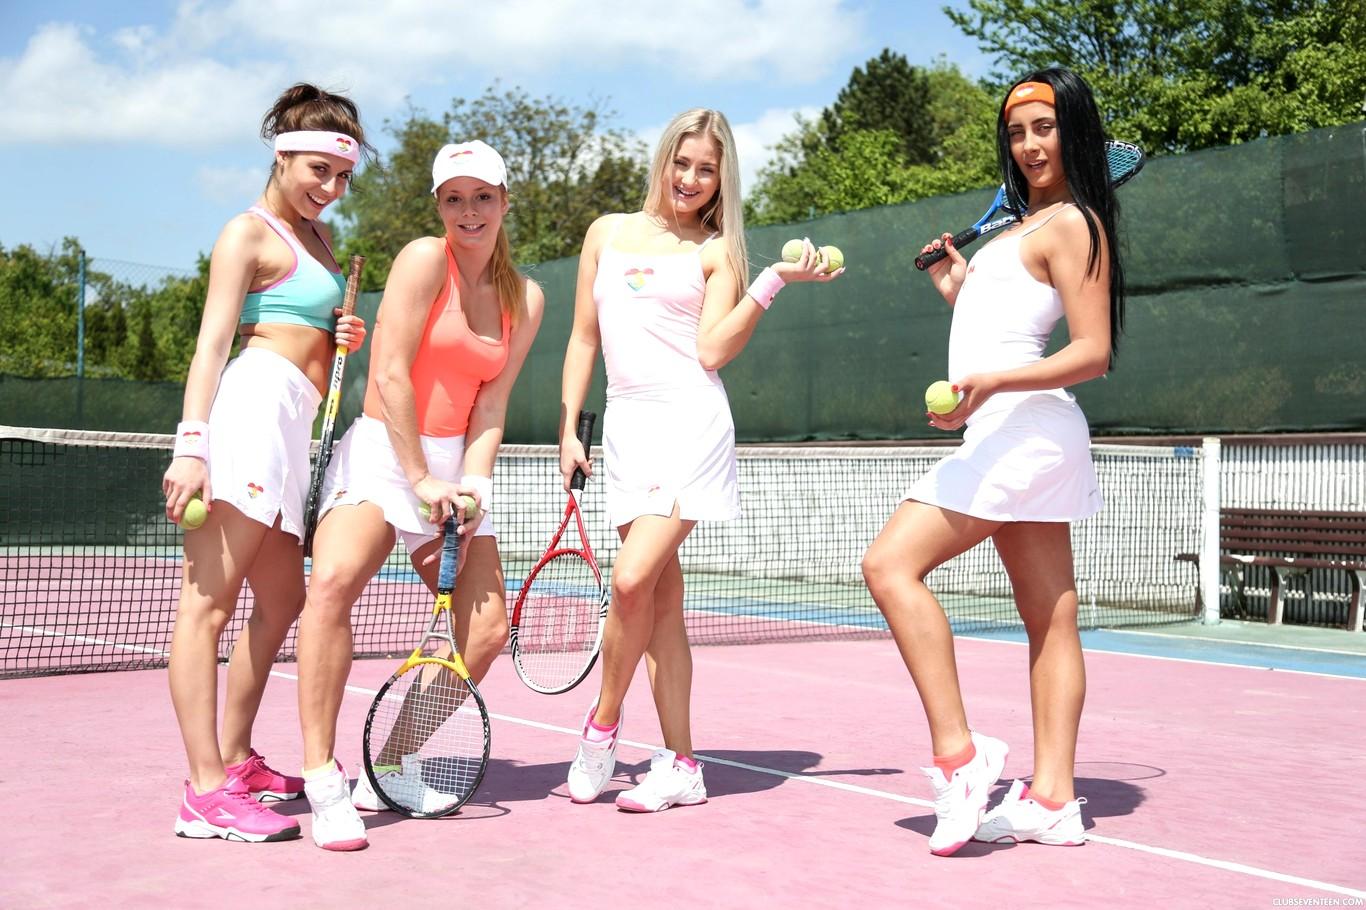 Lesbian tennis story